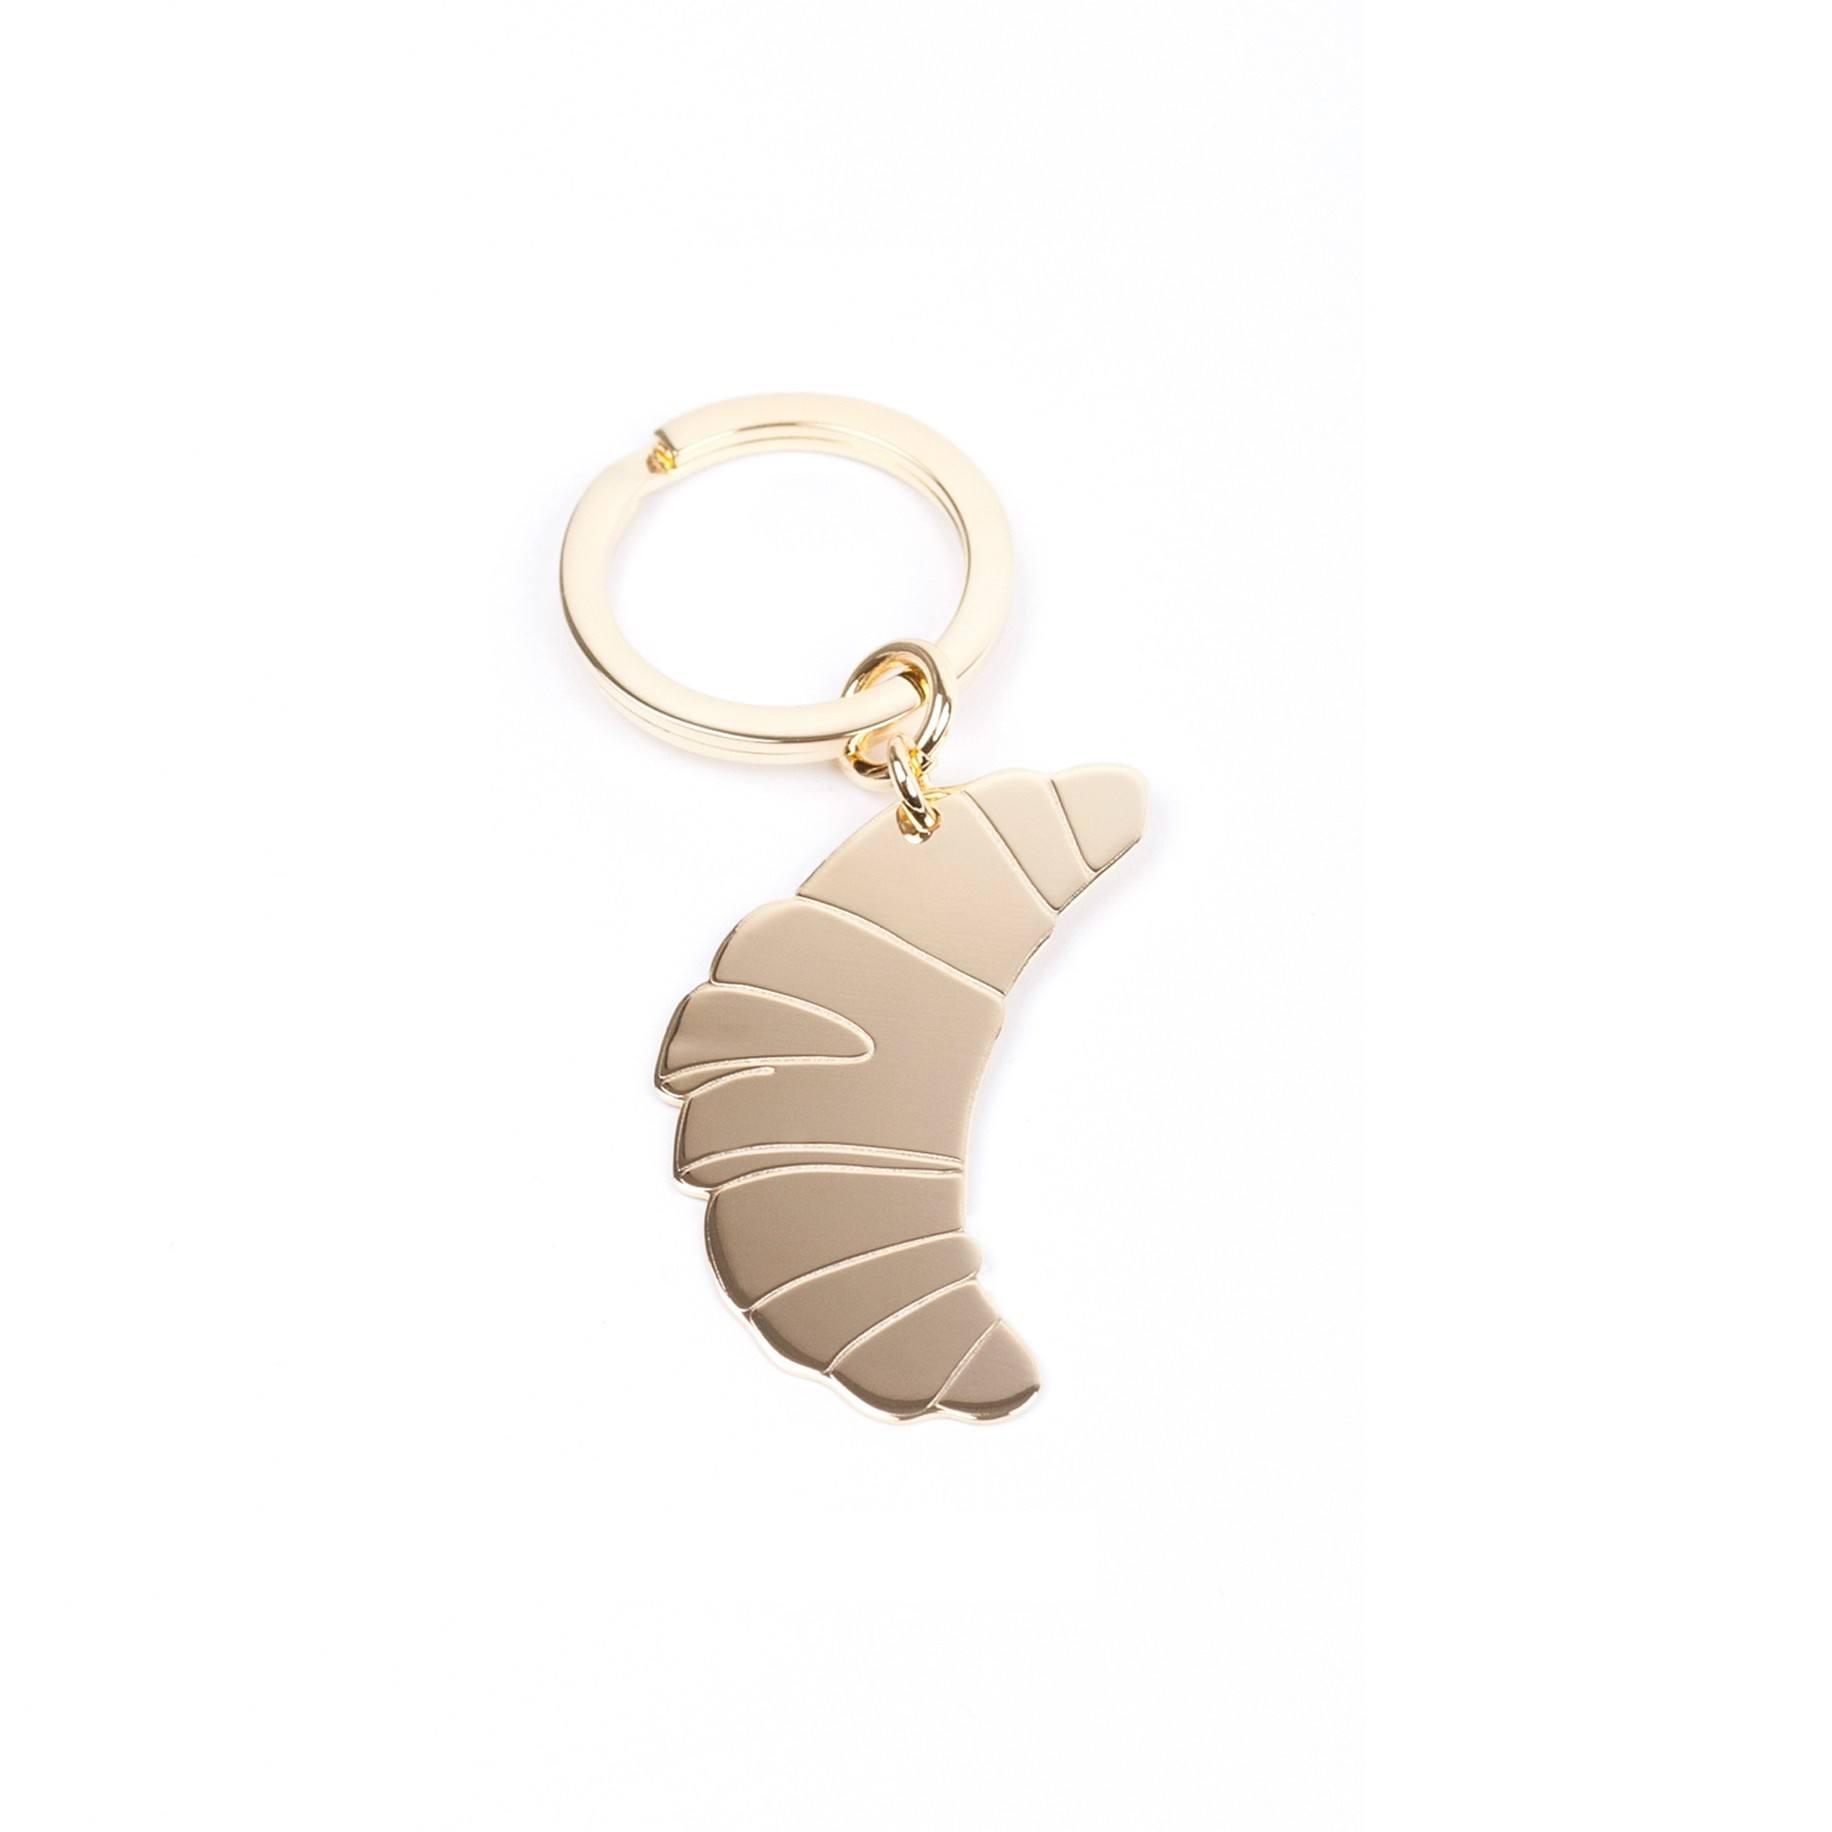 https://www.selecteddesigners.dk/media/catalog/product/j/u/jukserei-croissant-key-ring-website.jpg